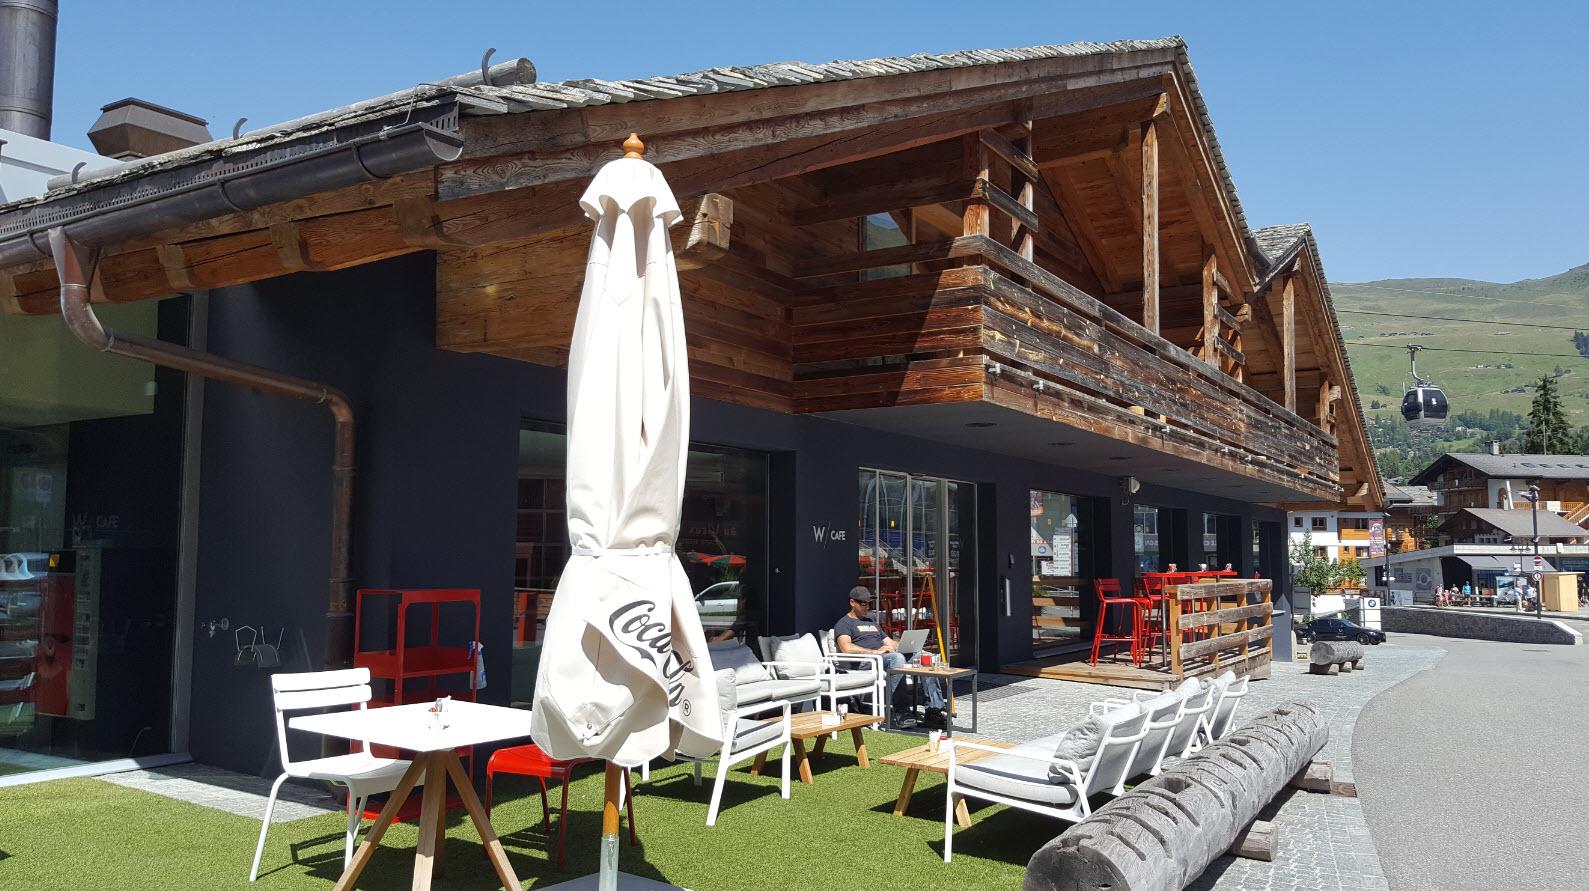 W Cafe terrasse